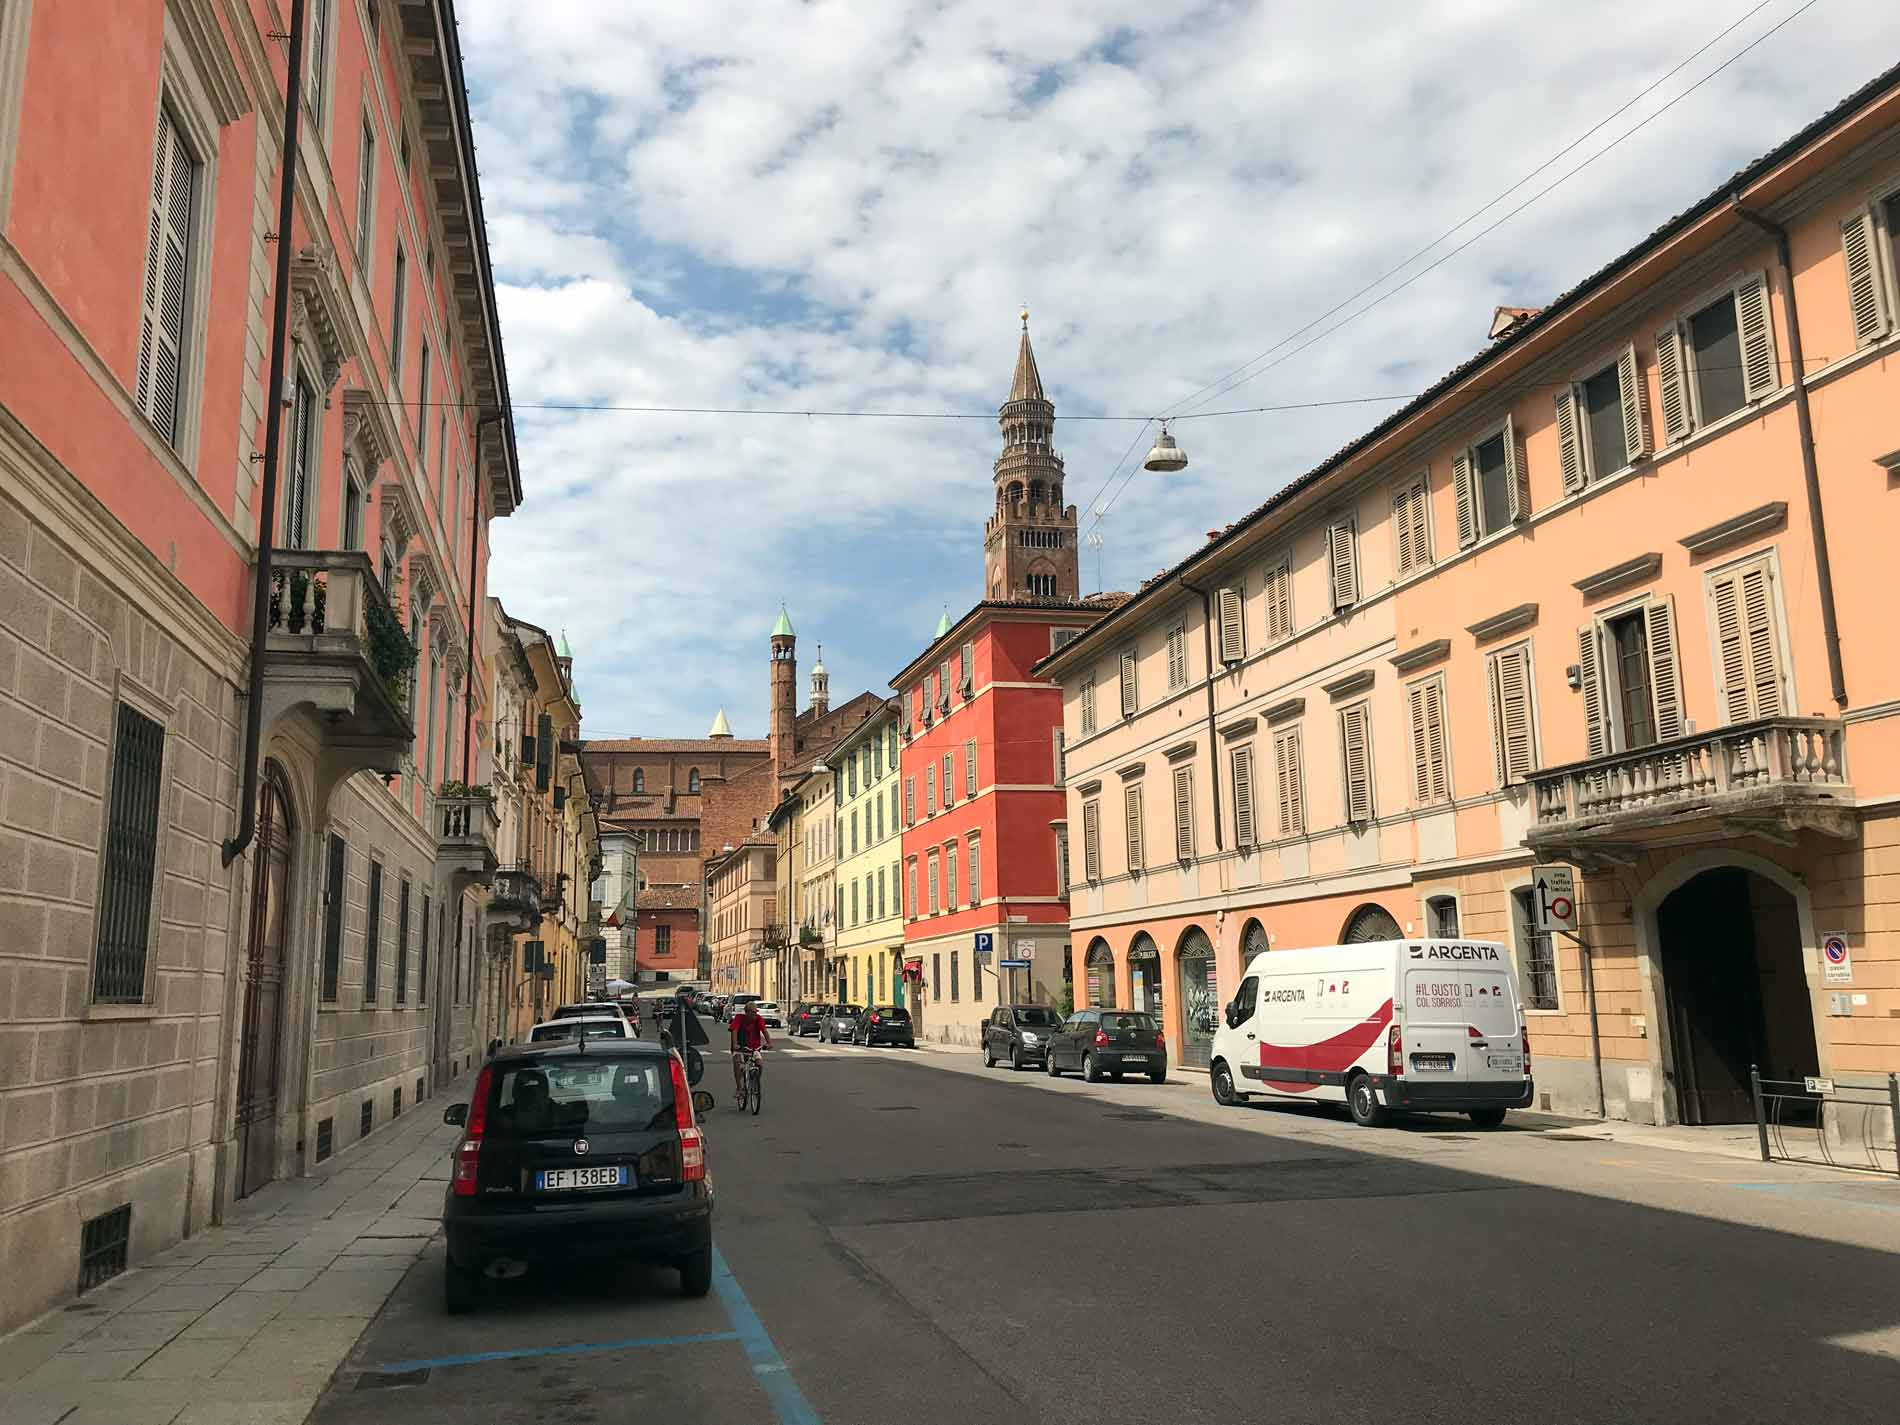 via-XI-febbraio-Cremona-auto-palazzo-torrazzo-nuvole